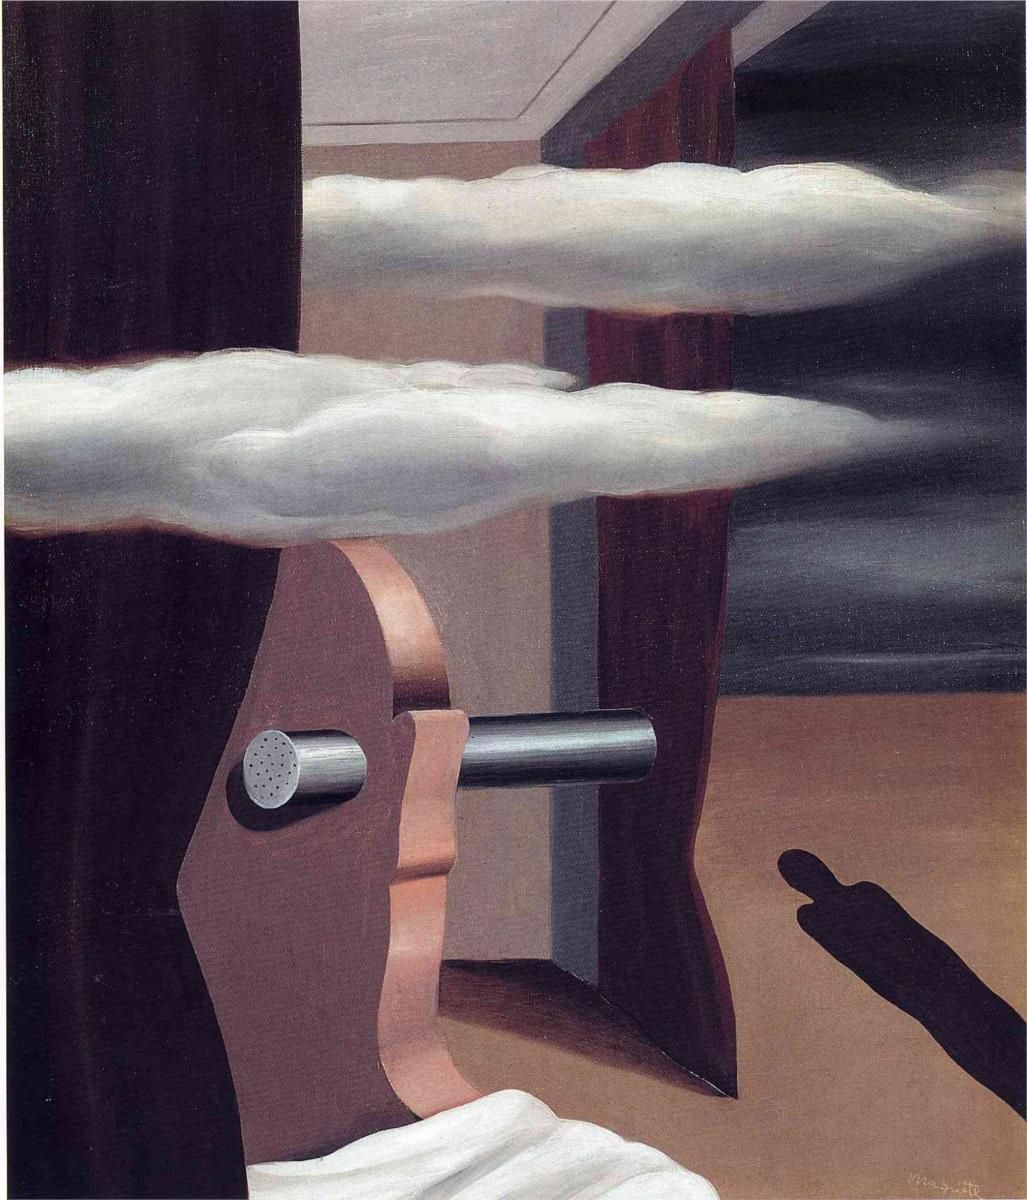 "Картина Рене Магритта ""Катапульта пустыни"" (The catapult of desert, 1926)"